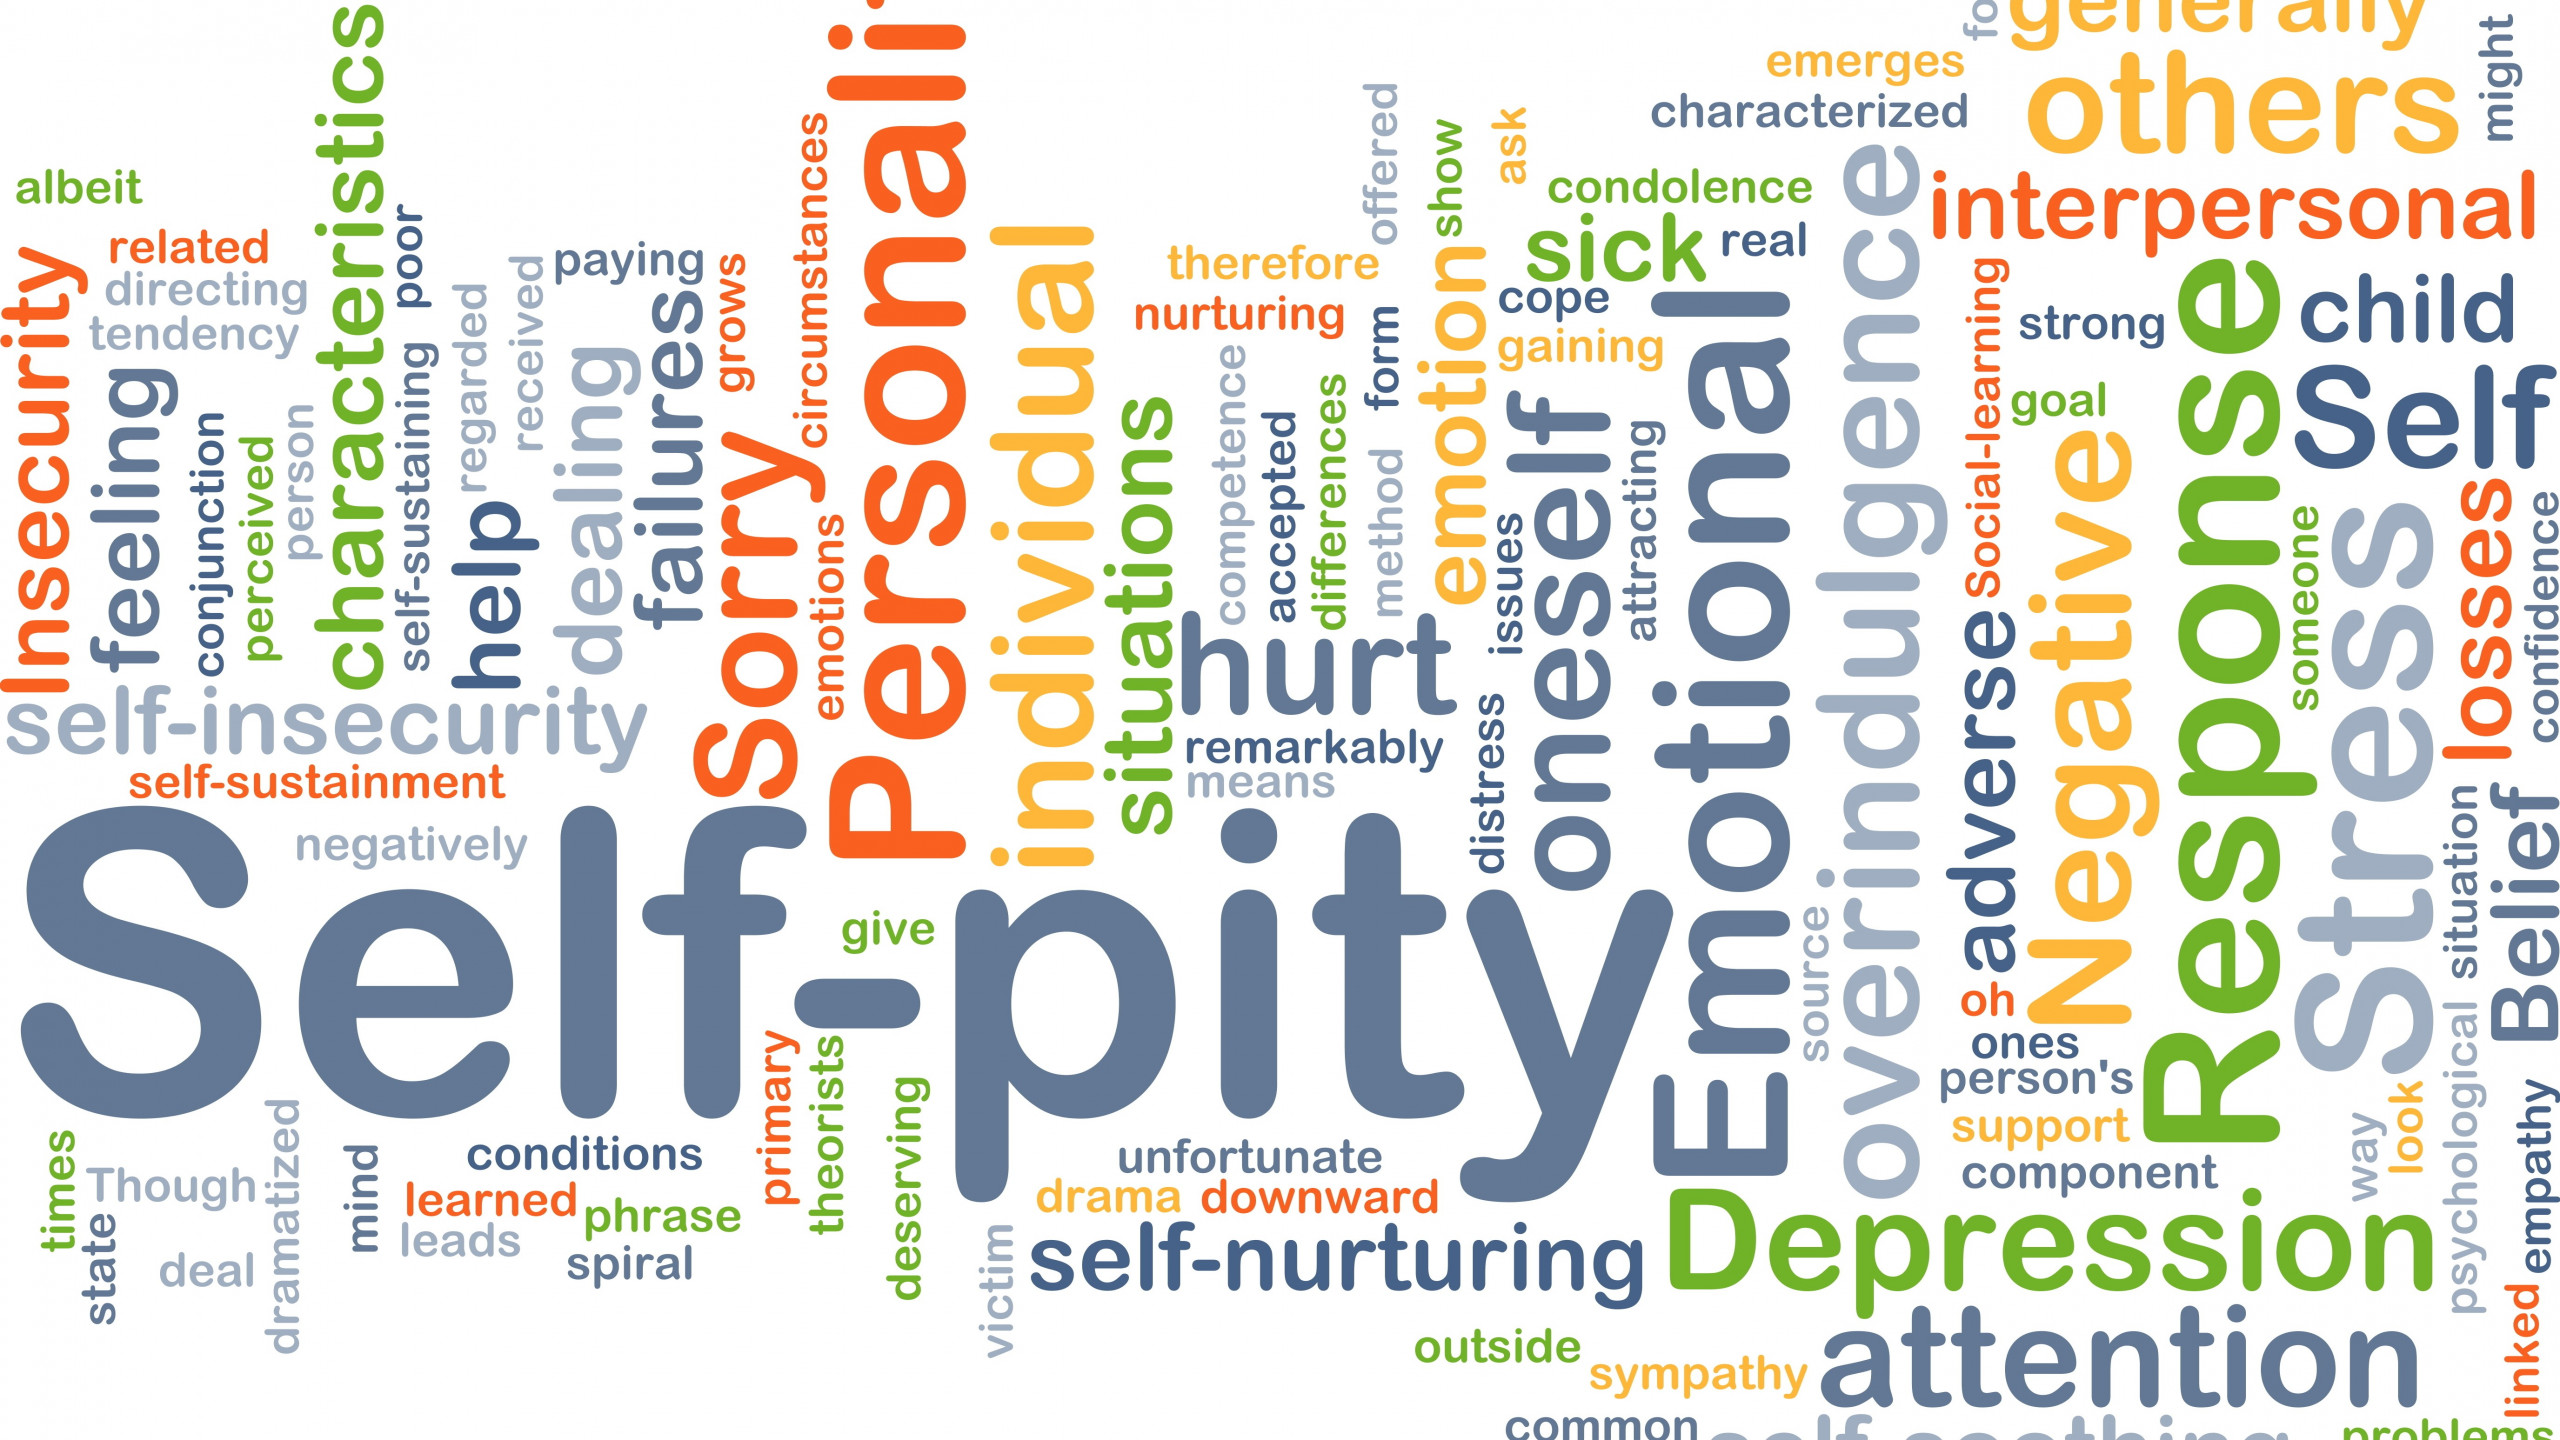 self-pity versus Depression